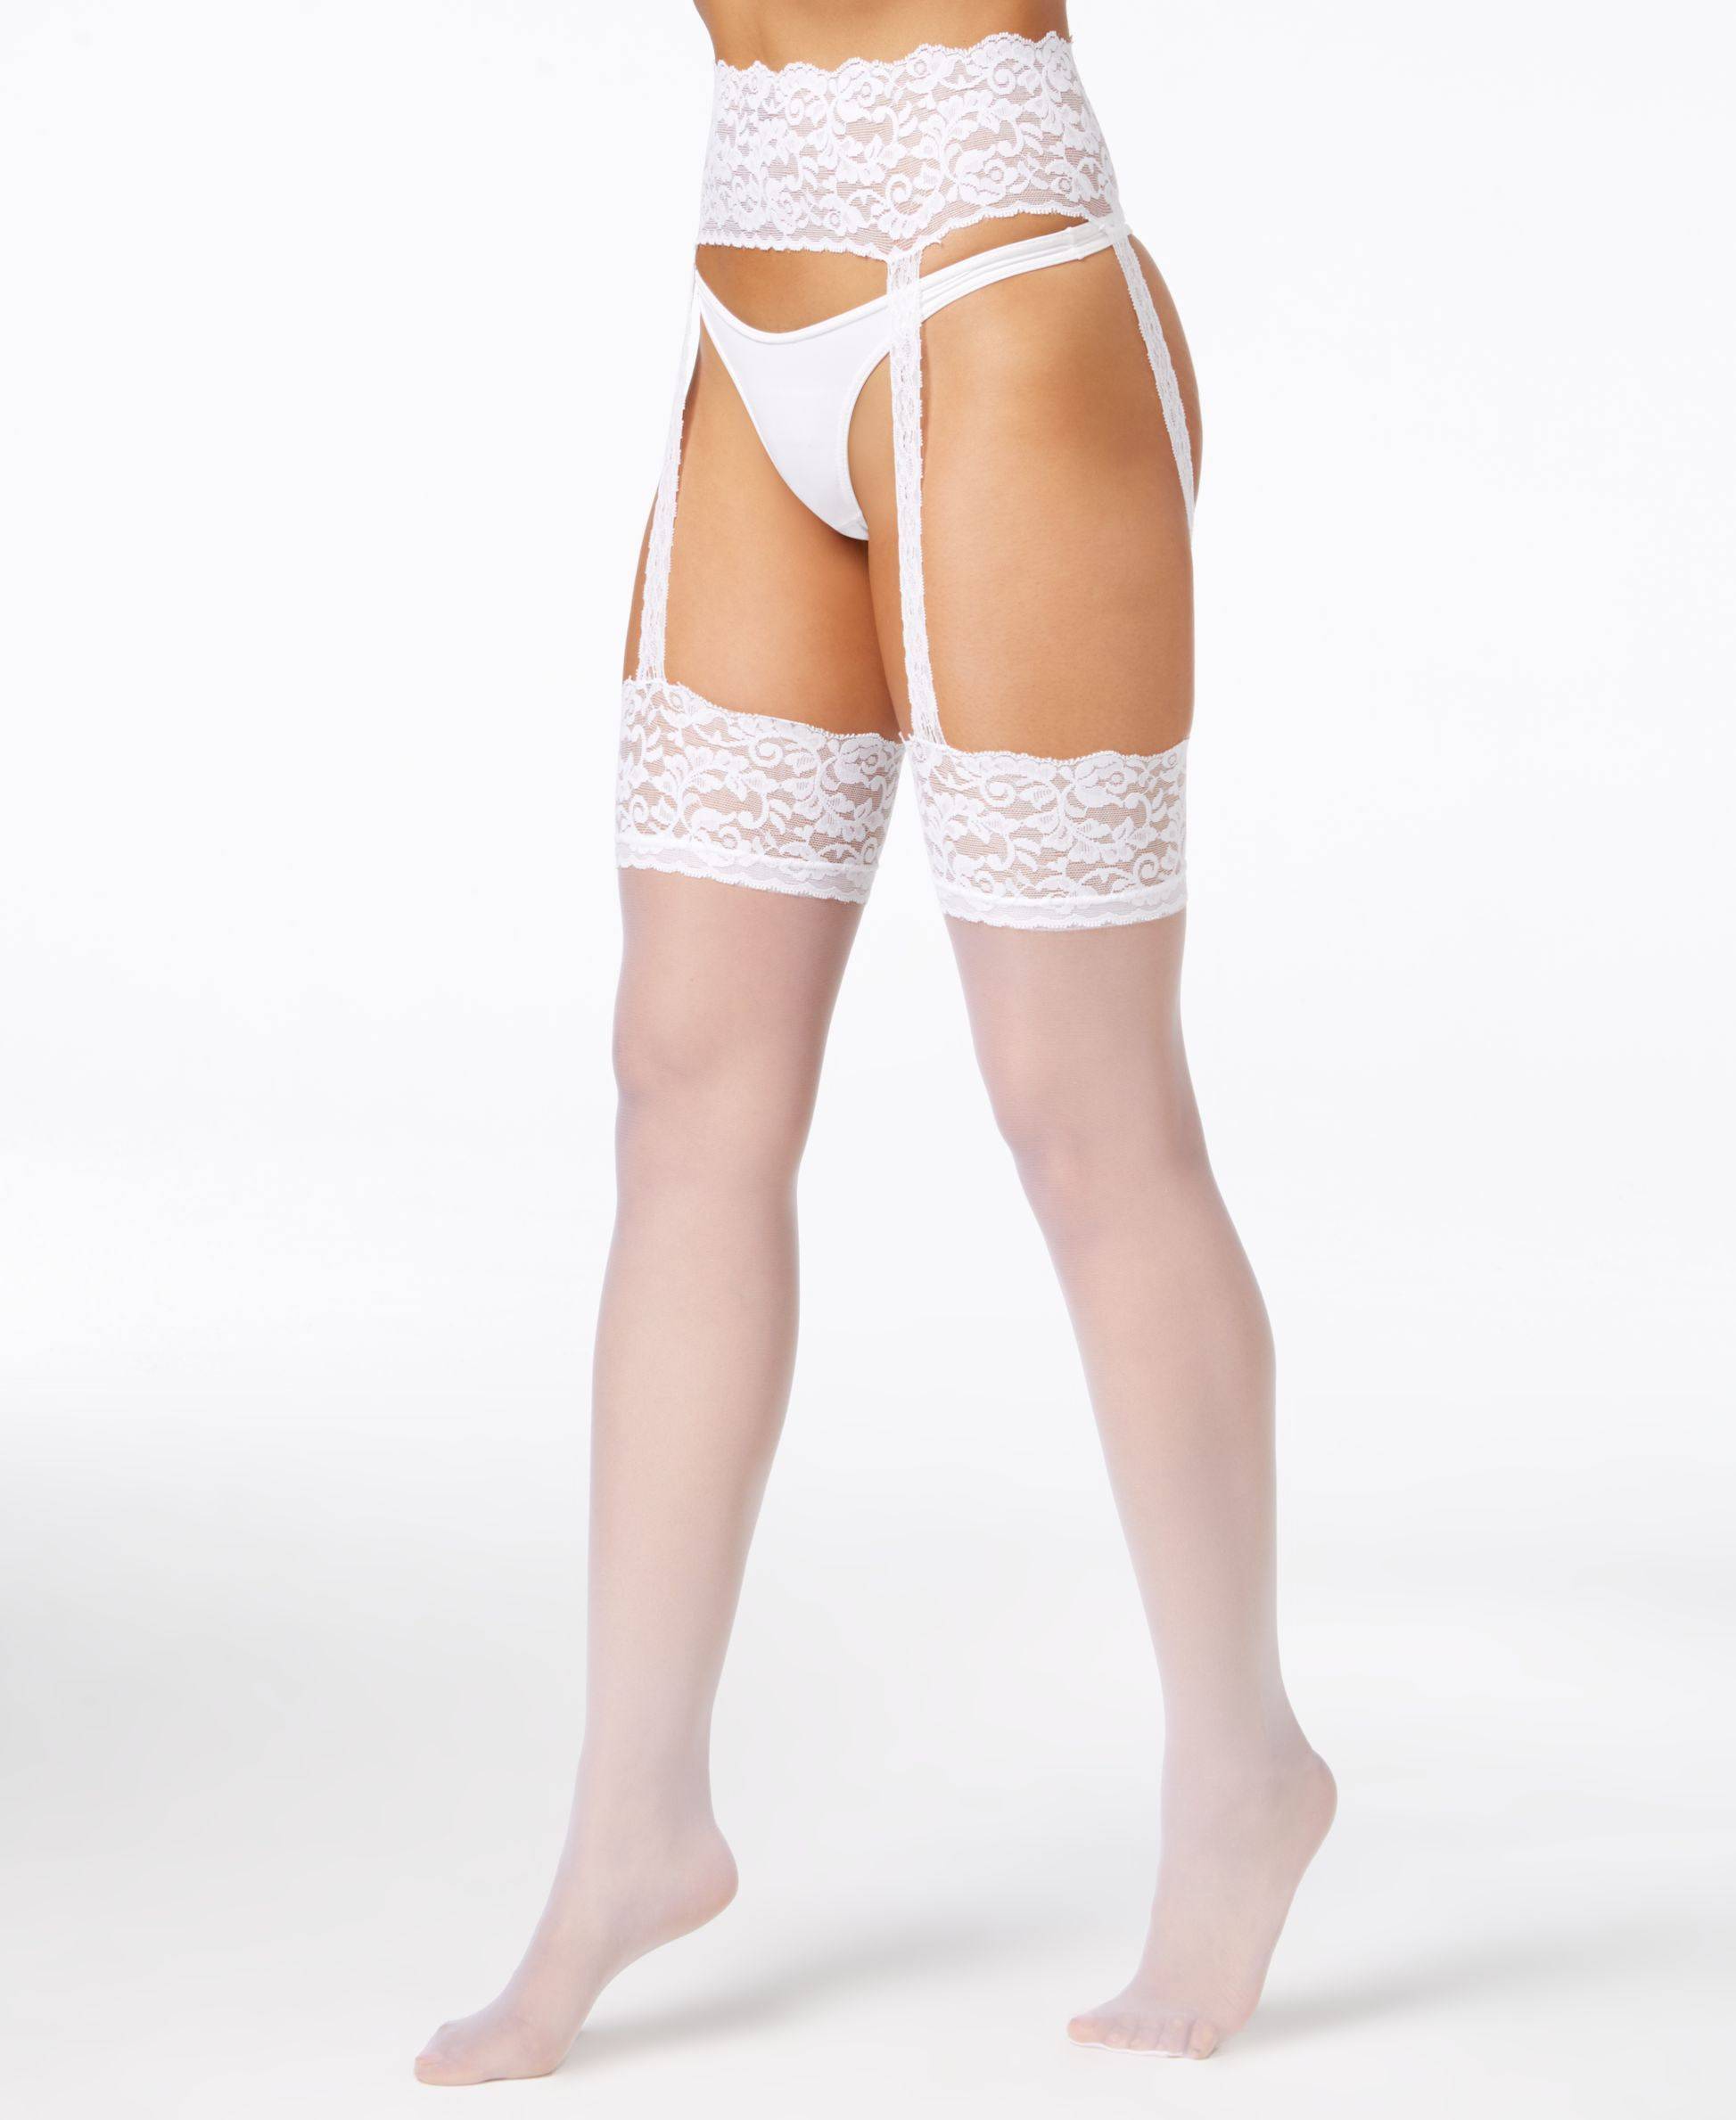 207efbc4b8568 Berkshire Sheer Hosiery, Lace Garter and Stockings - Handbags & Accessories  - Macy's